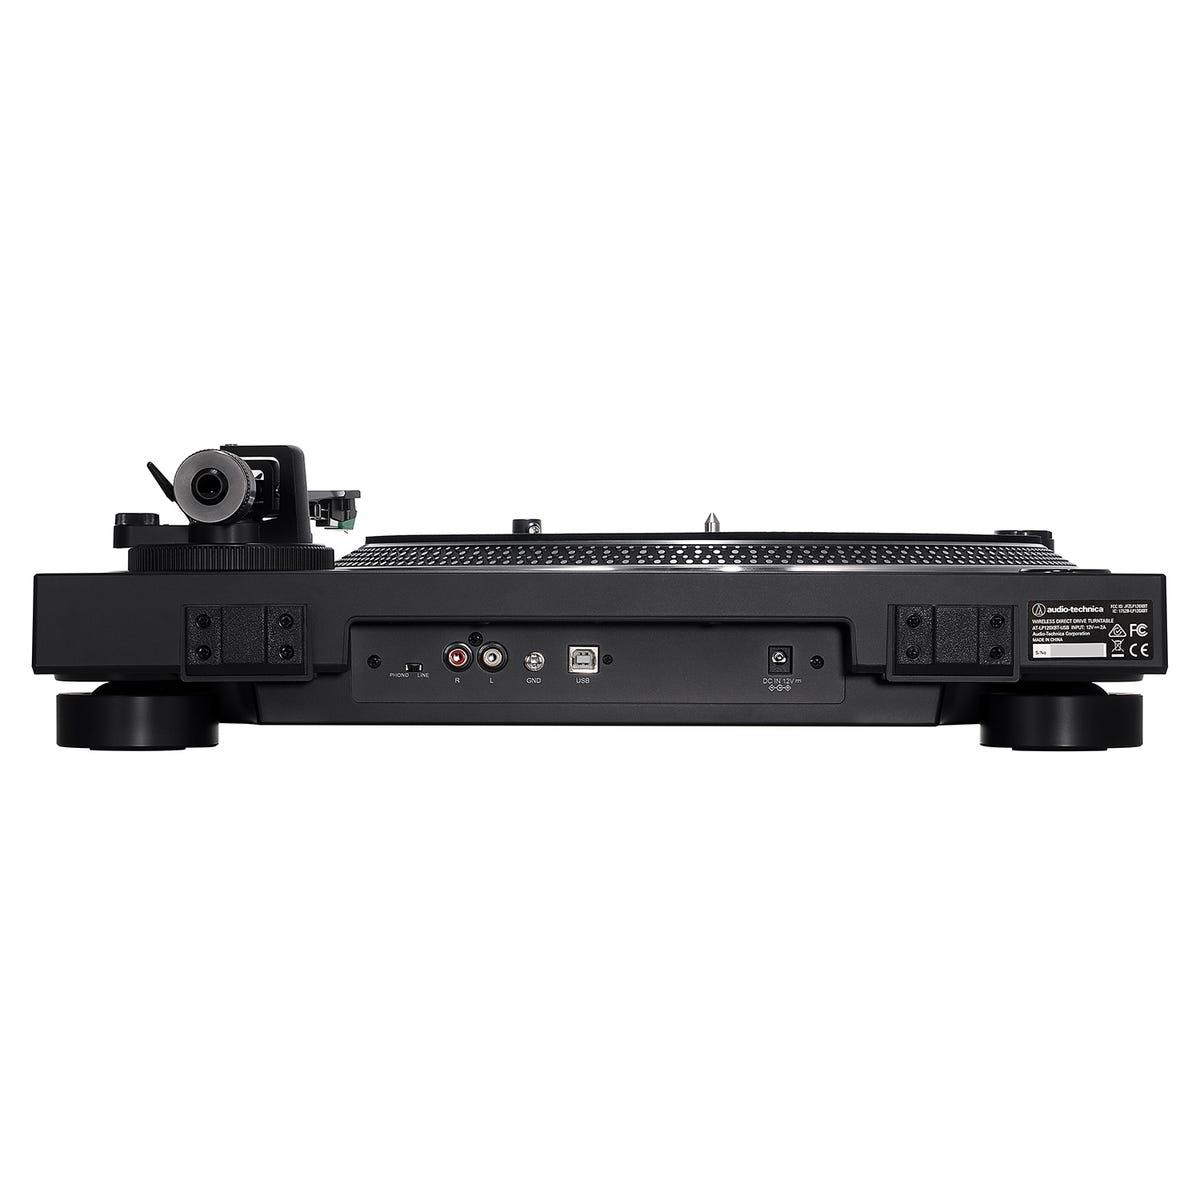 Audio Technica LP120xBT-USB Wireless Direct-Drive Turntable (Bluetooth + USB)